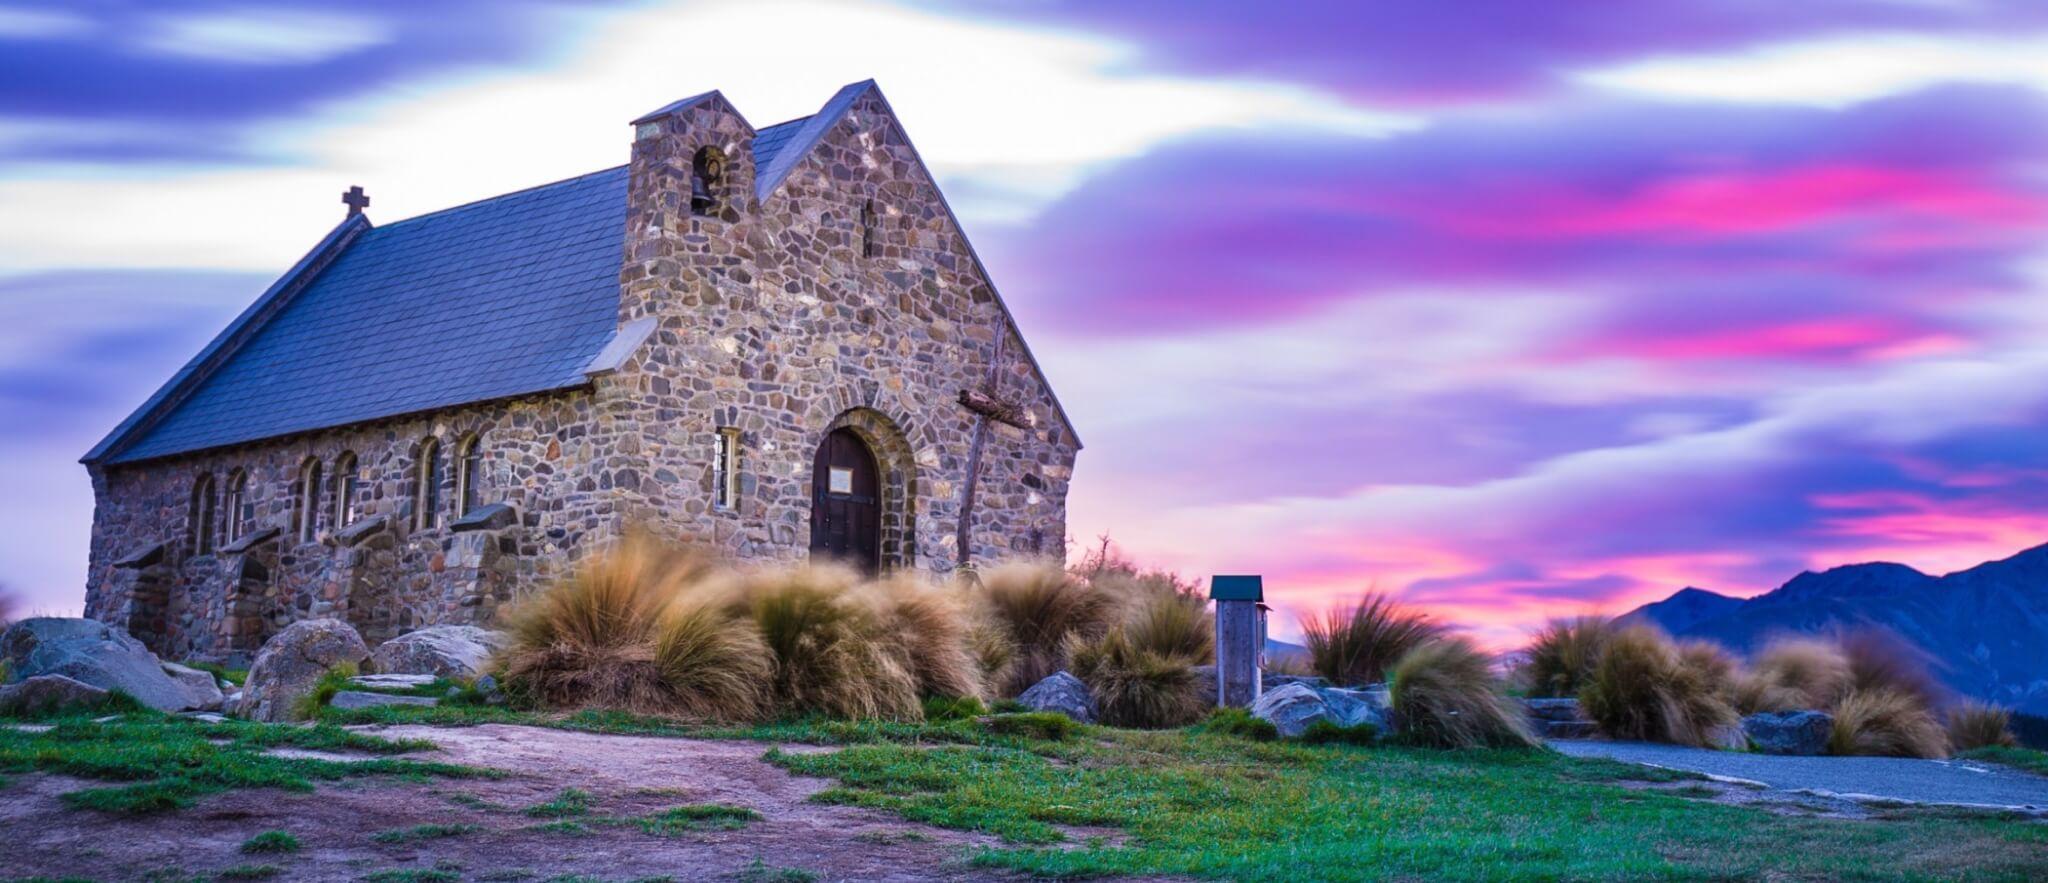 Church-of-the-good-shepherd New Zealand